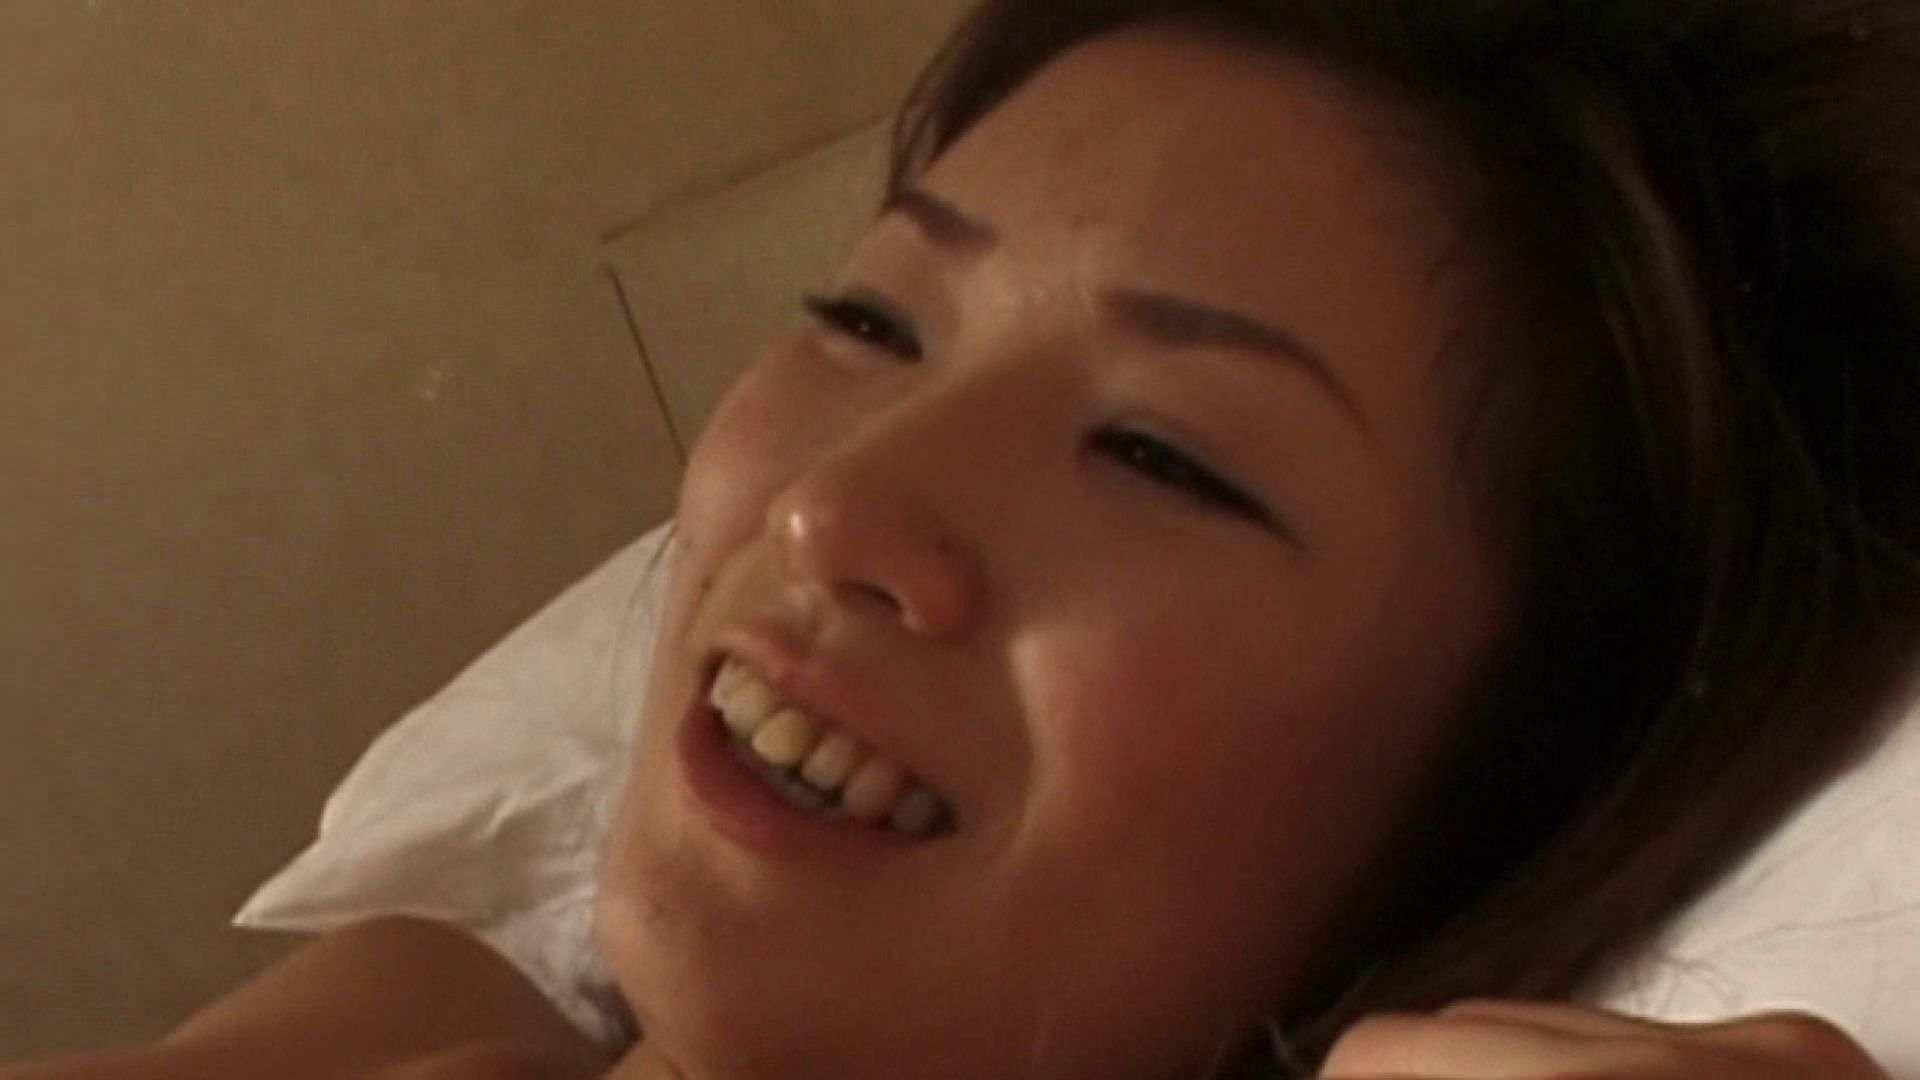 S級厳選美女ビッチガールVol.53 美しいOLの裸体 オメコ動画キャプチャ 100pic 26